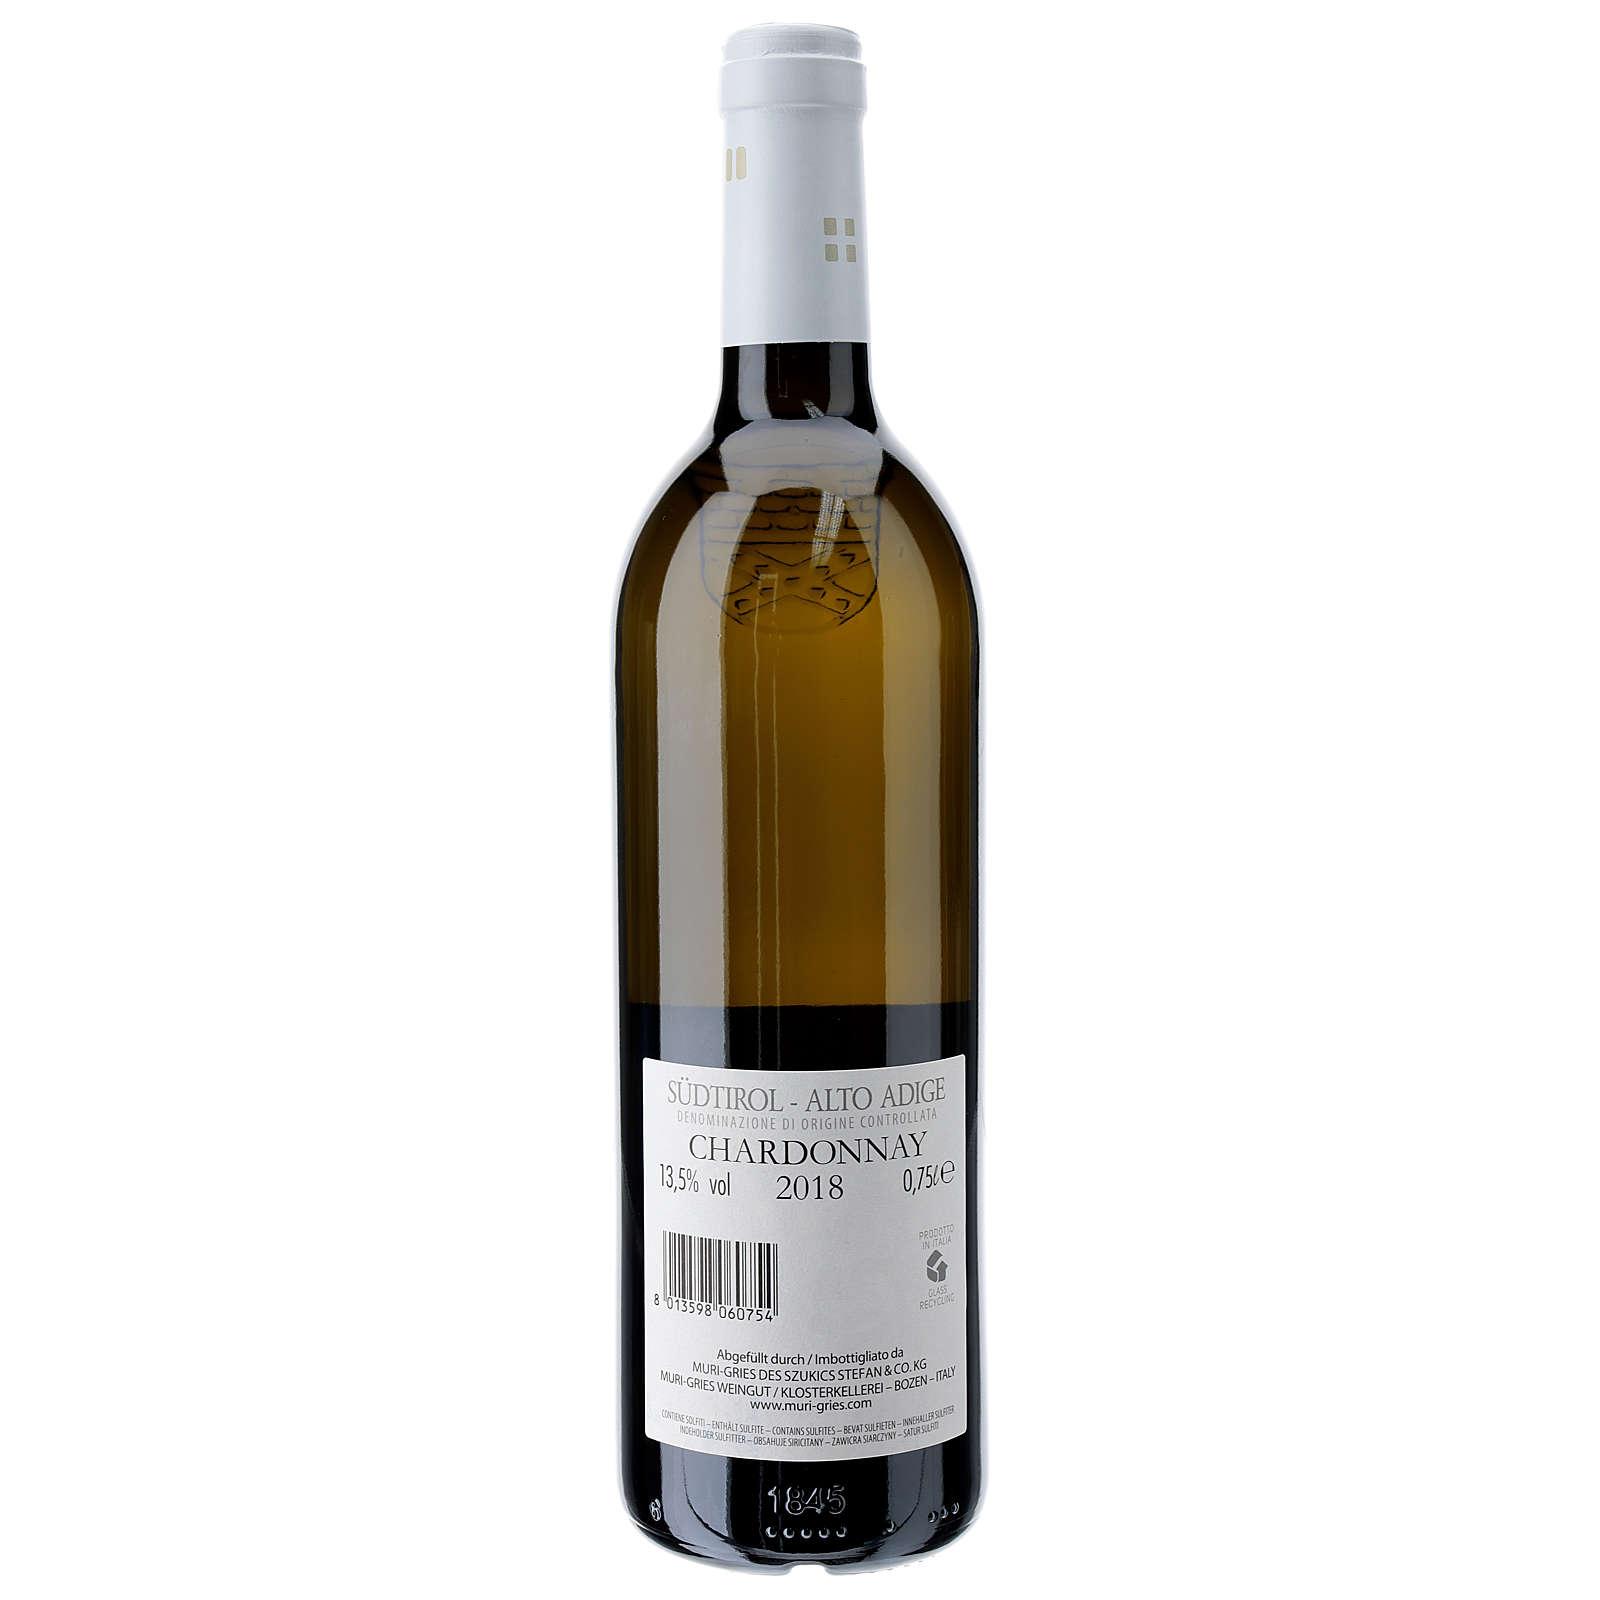 Vino Chardonny DOC 2018 Abadía Muri Gries 750 ml 3